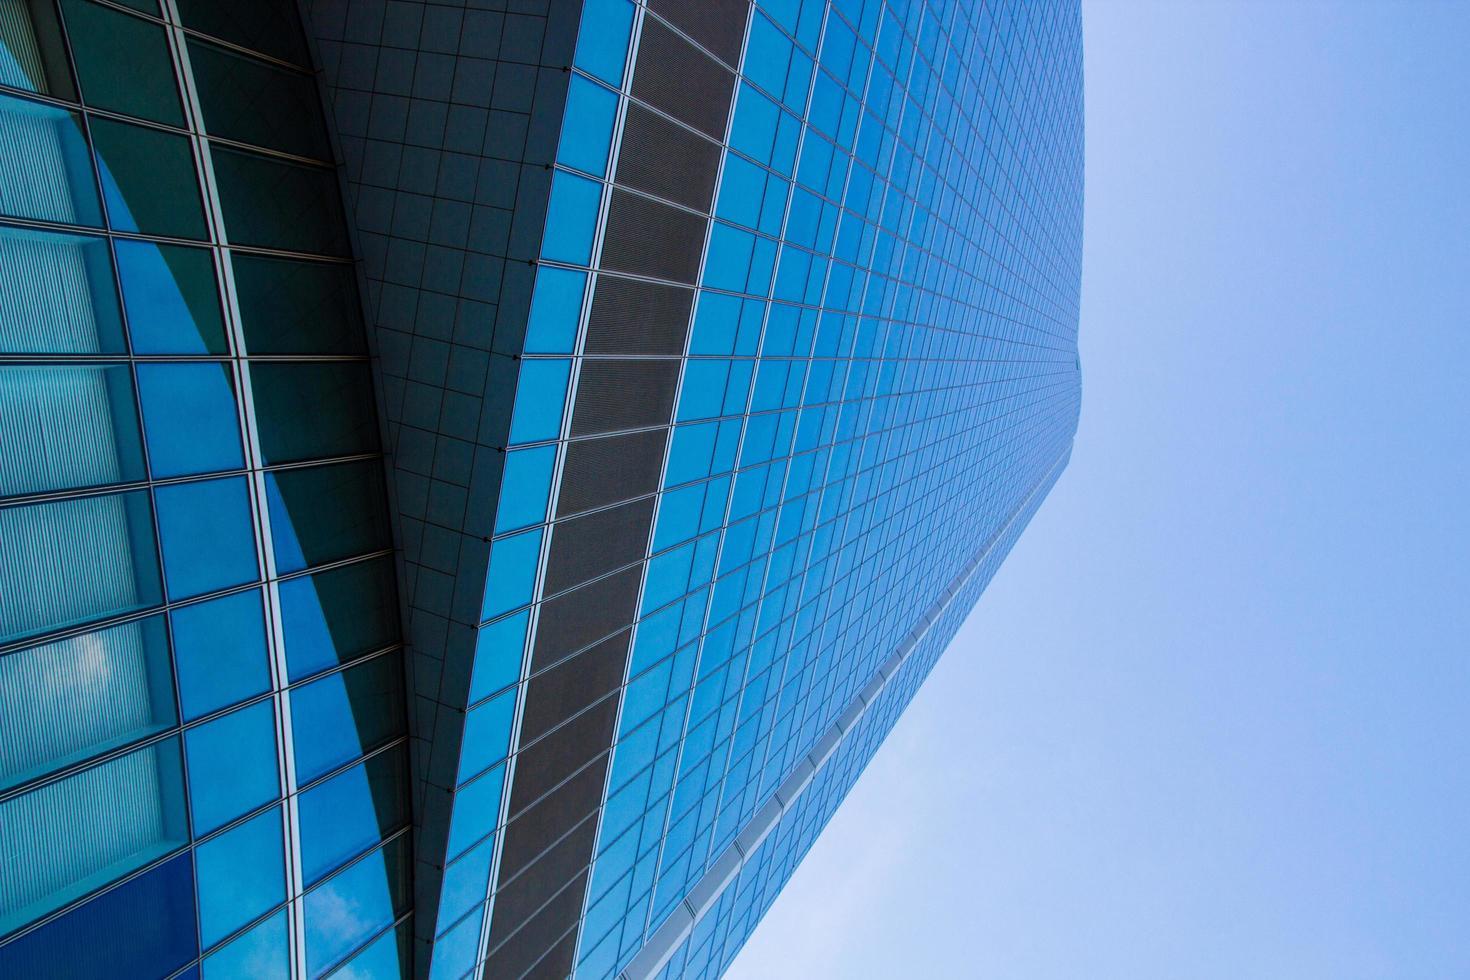 lage hoekmening van gebouw foto